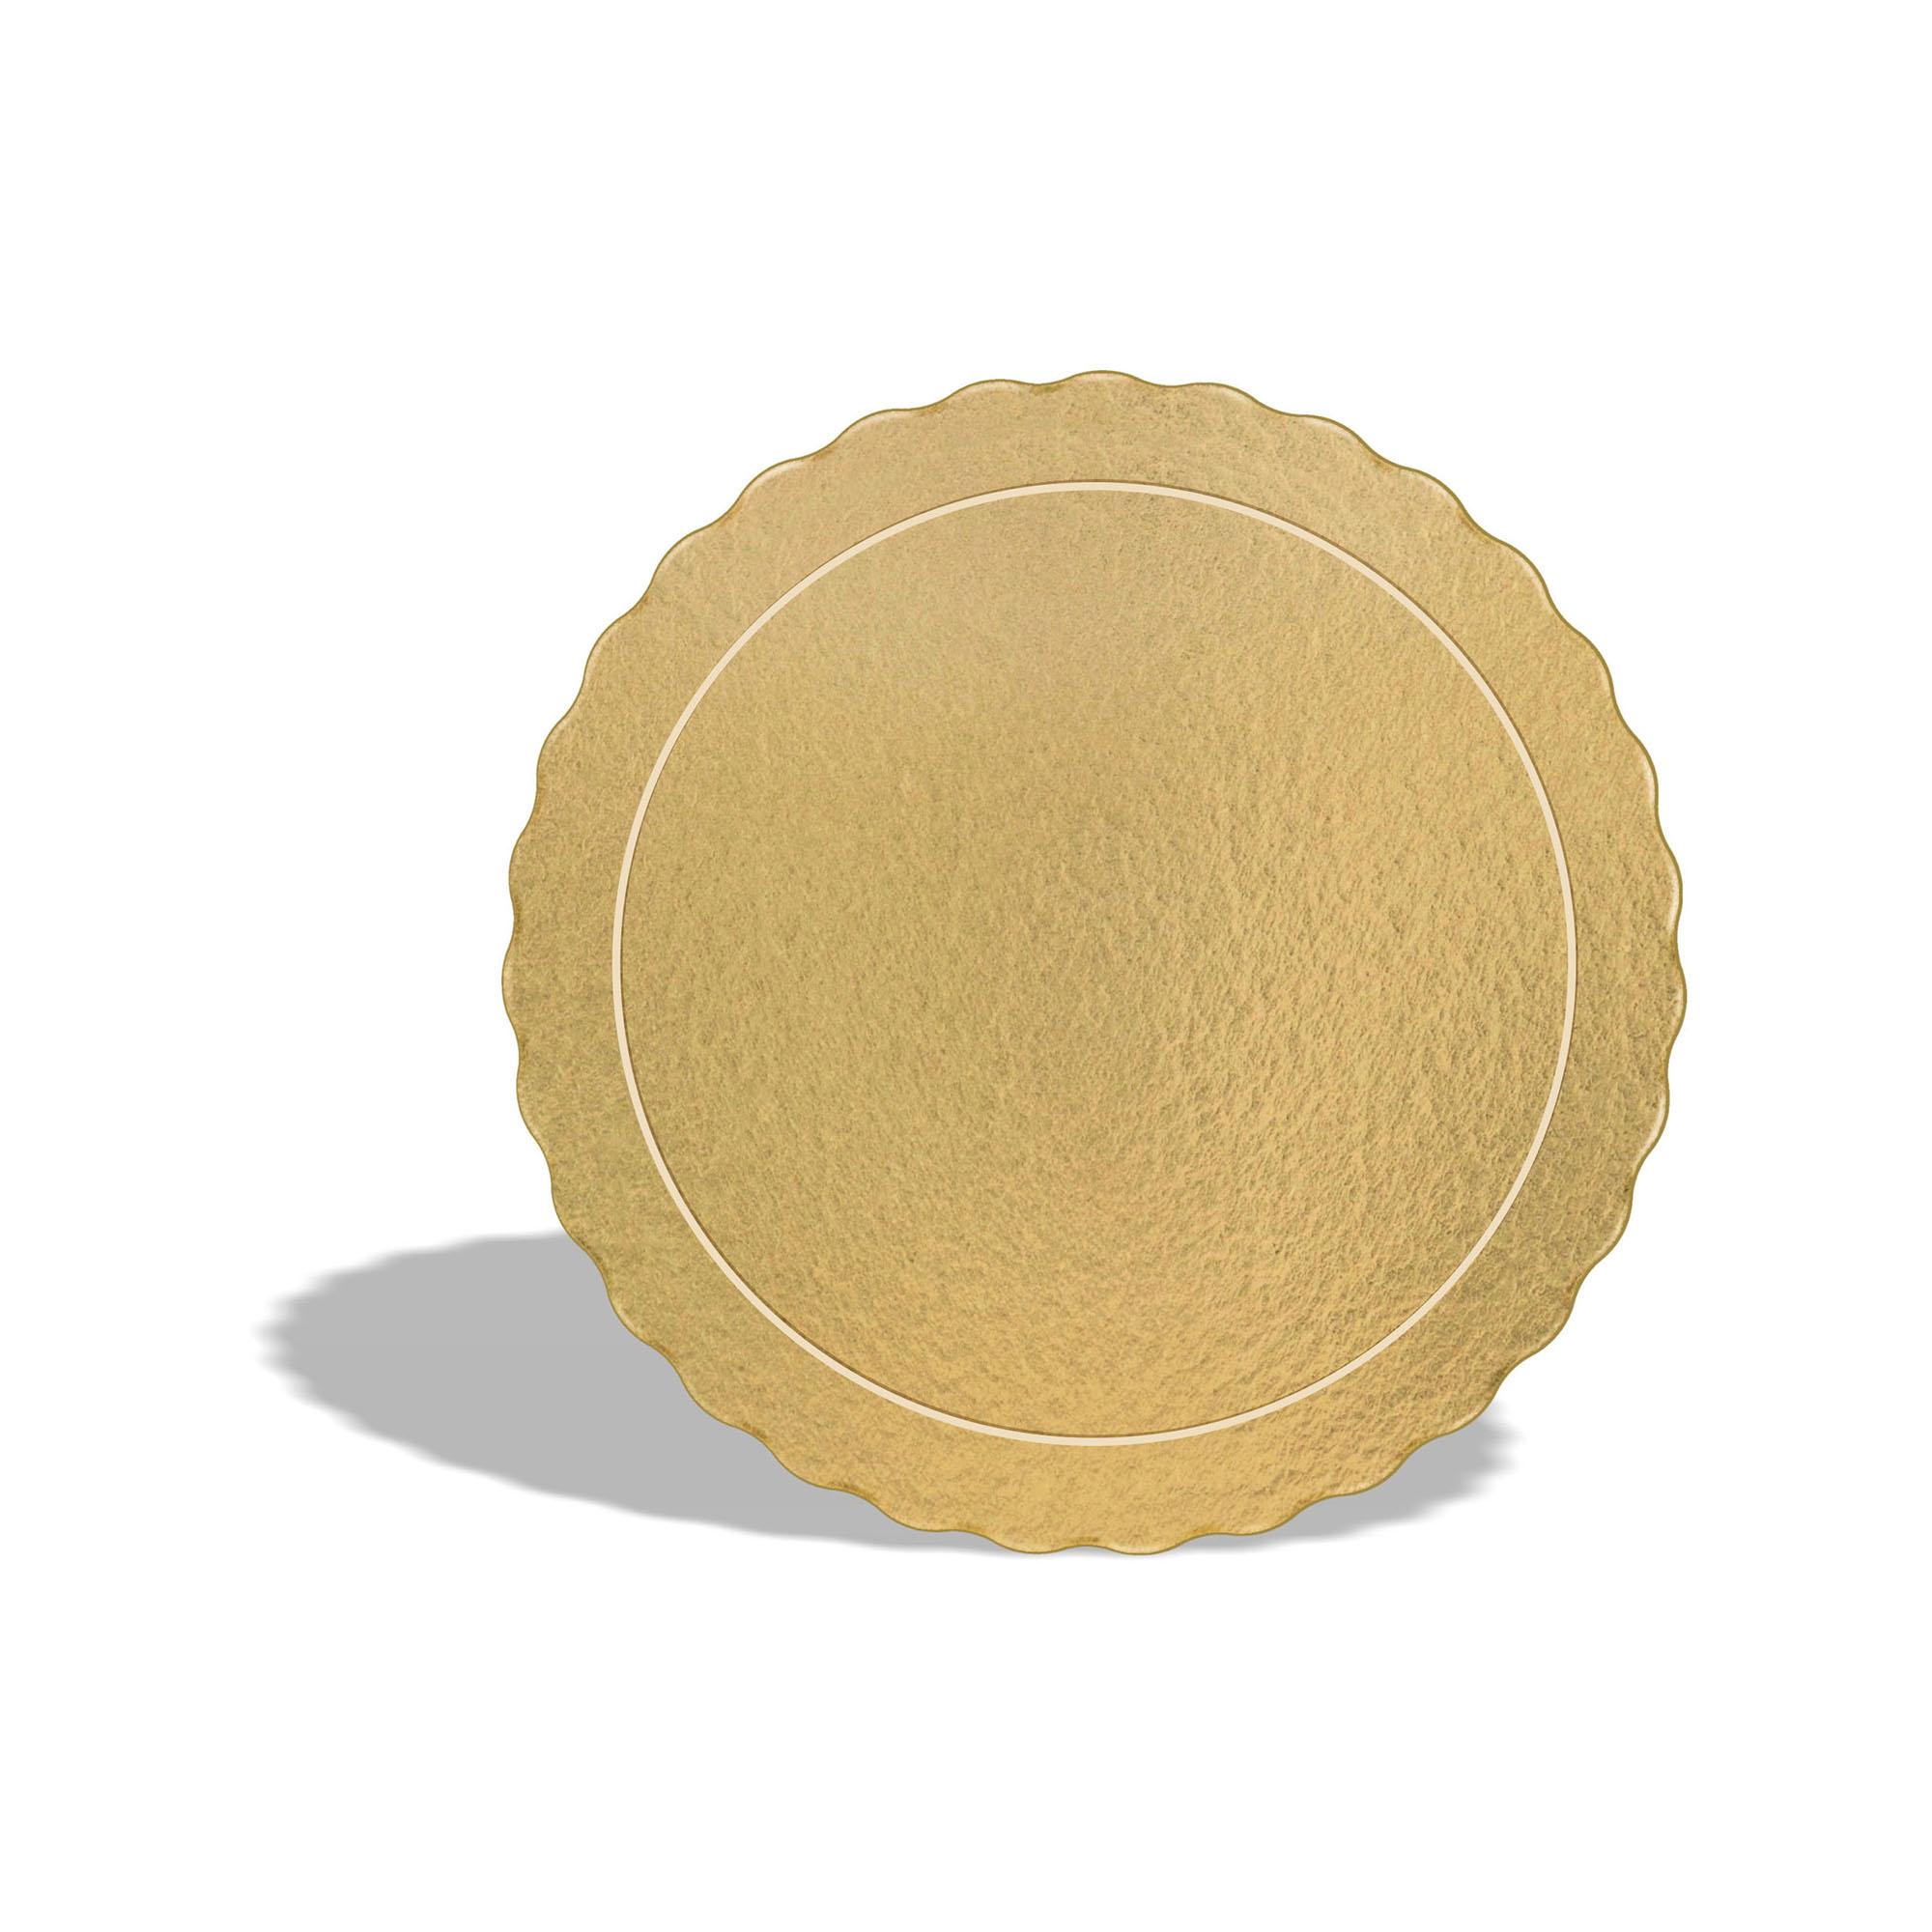 100 Bases Laminadas, Suporte P/ Bolo, Cake Board, 28cm - Ouro